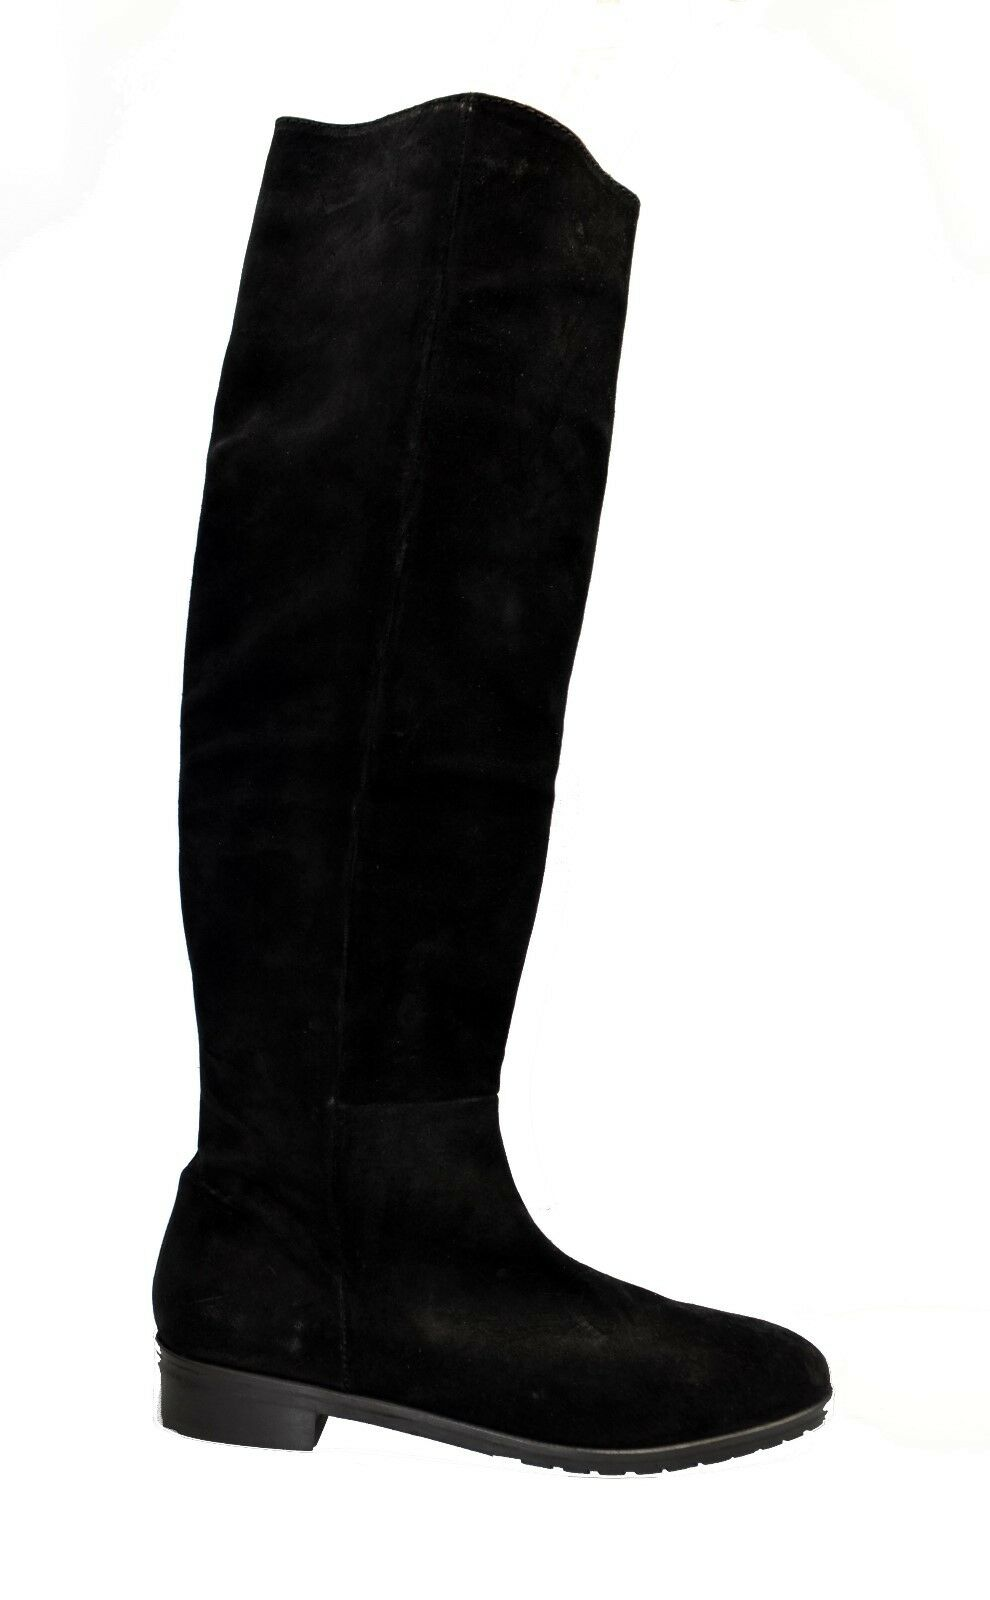 ANA MORENO Absatzschuhe, Stiefel Gr. 40  Absatzschuhe, MORENO schwarz, Damen Schuhe 4/18 M2 b57d16